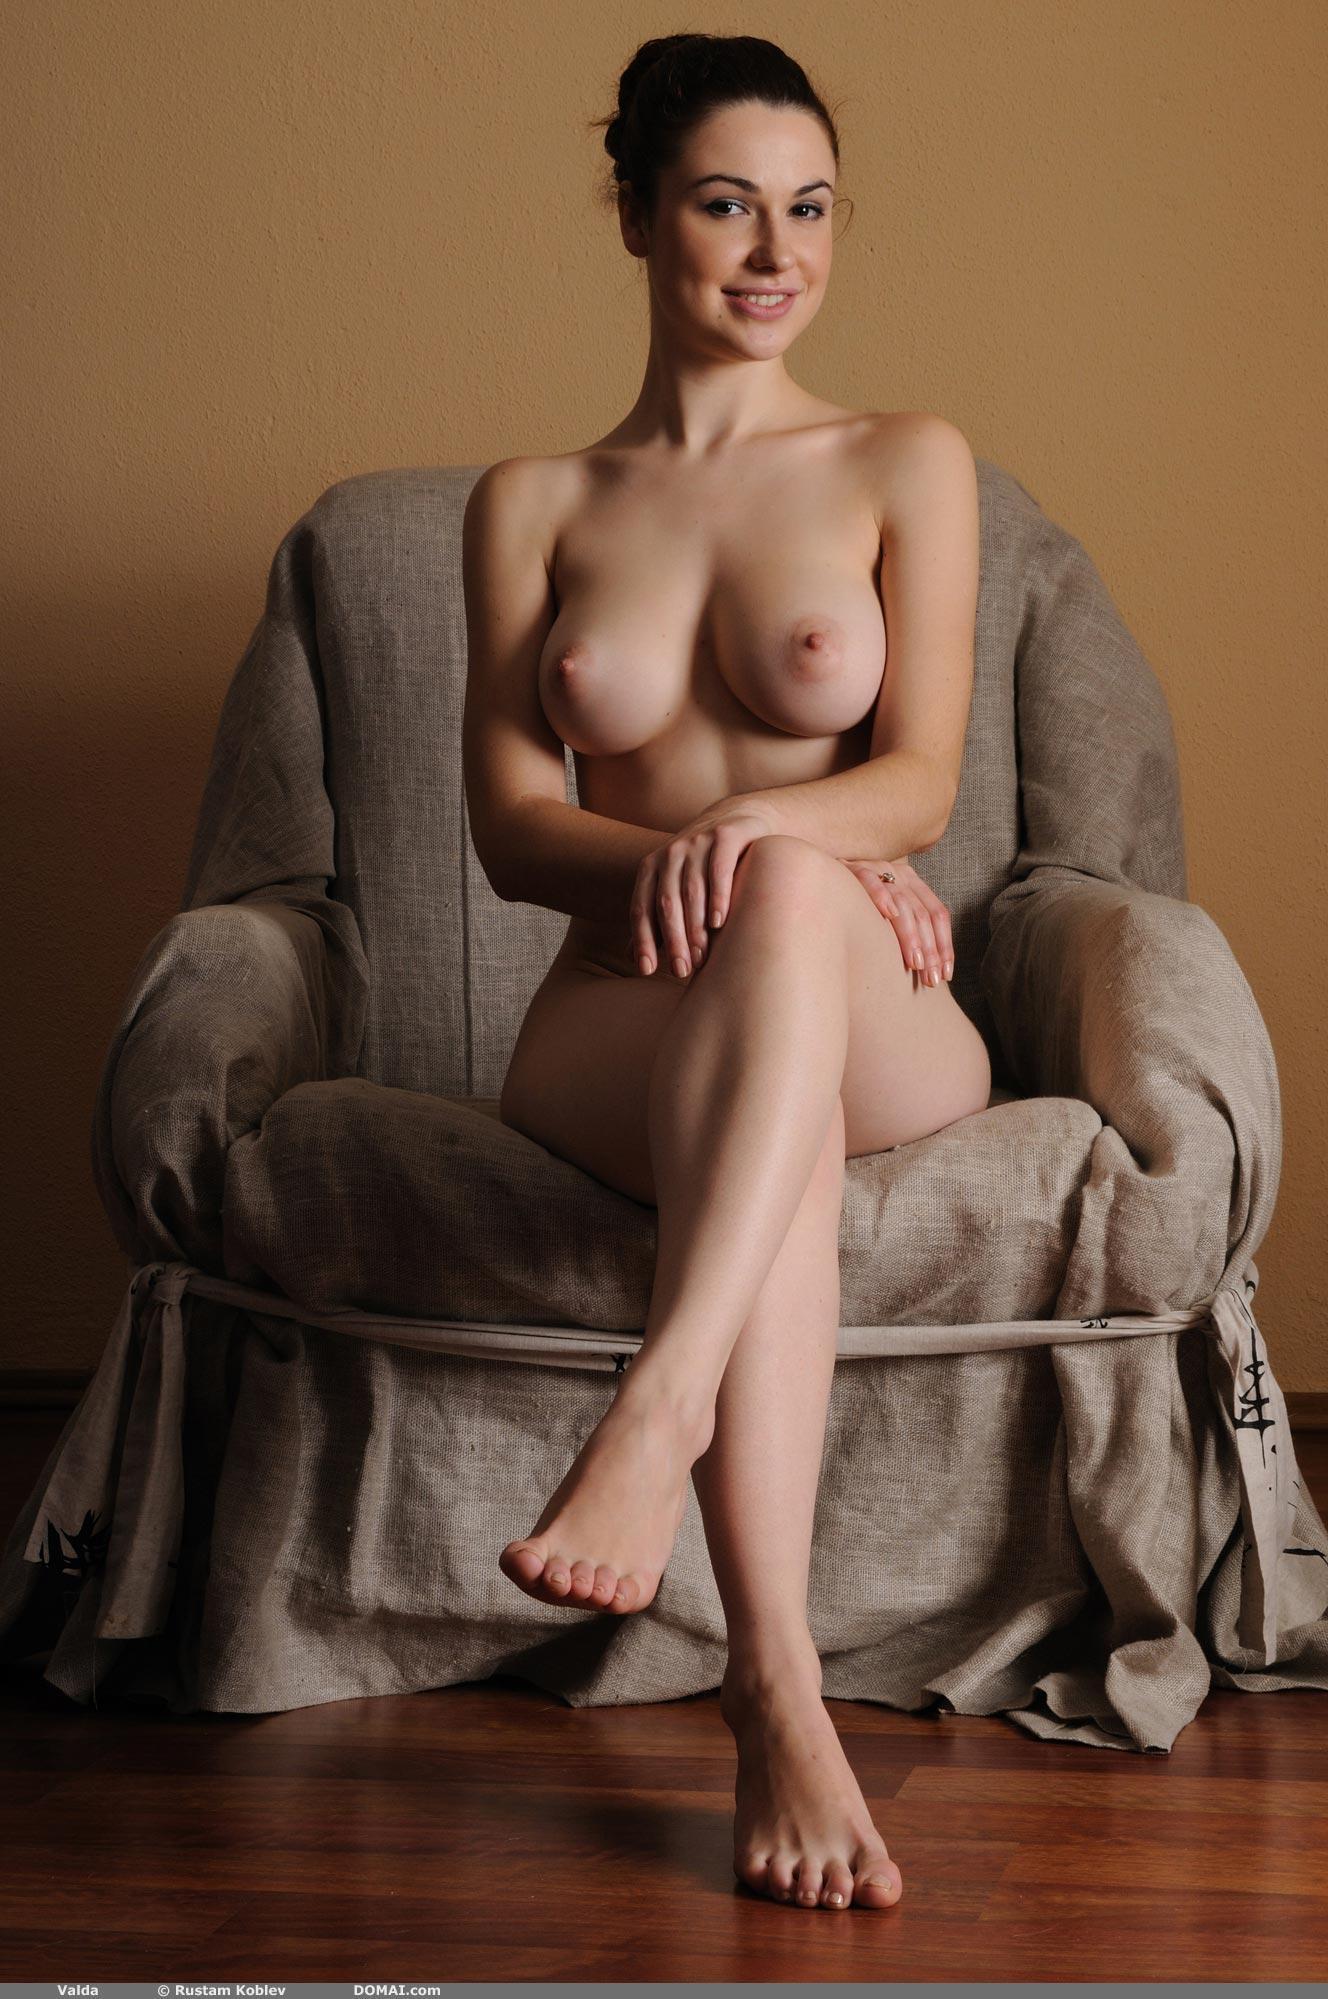 Раздетая девица сидит на кресле - фотографии